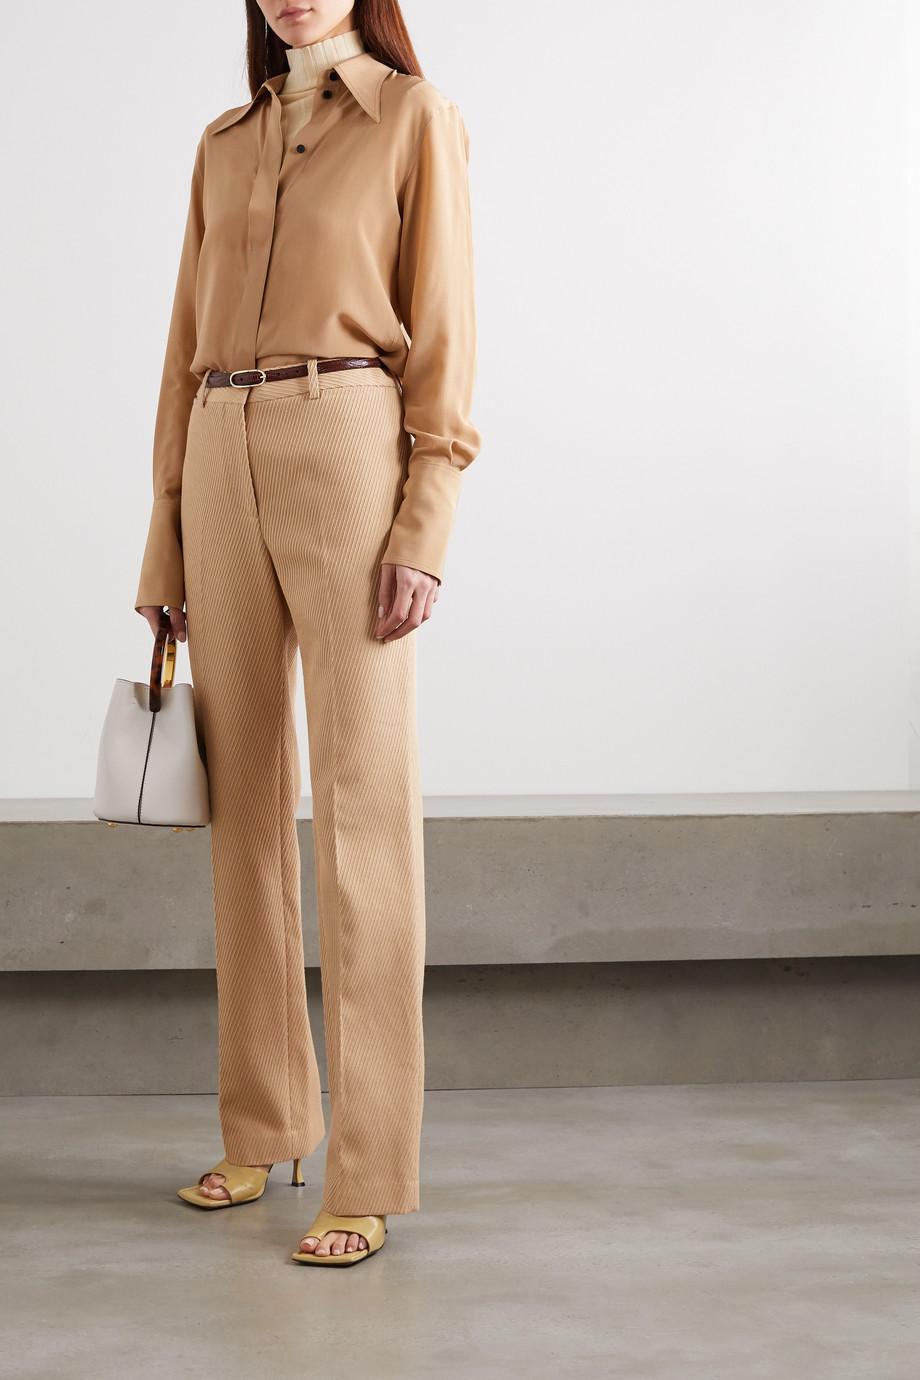 Victoria Beckham Crepe de chine shirt